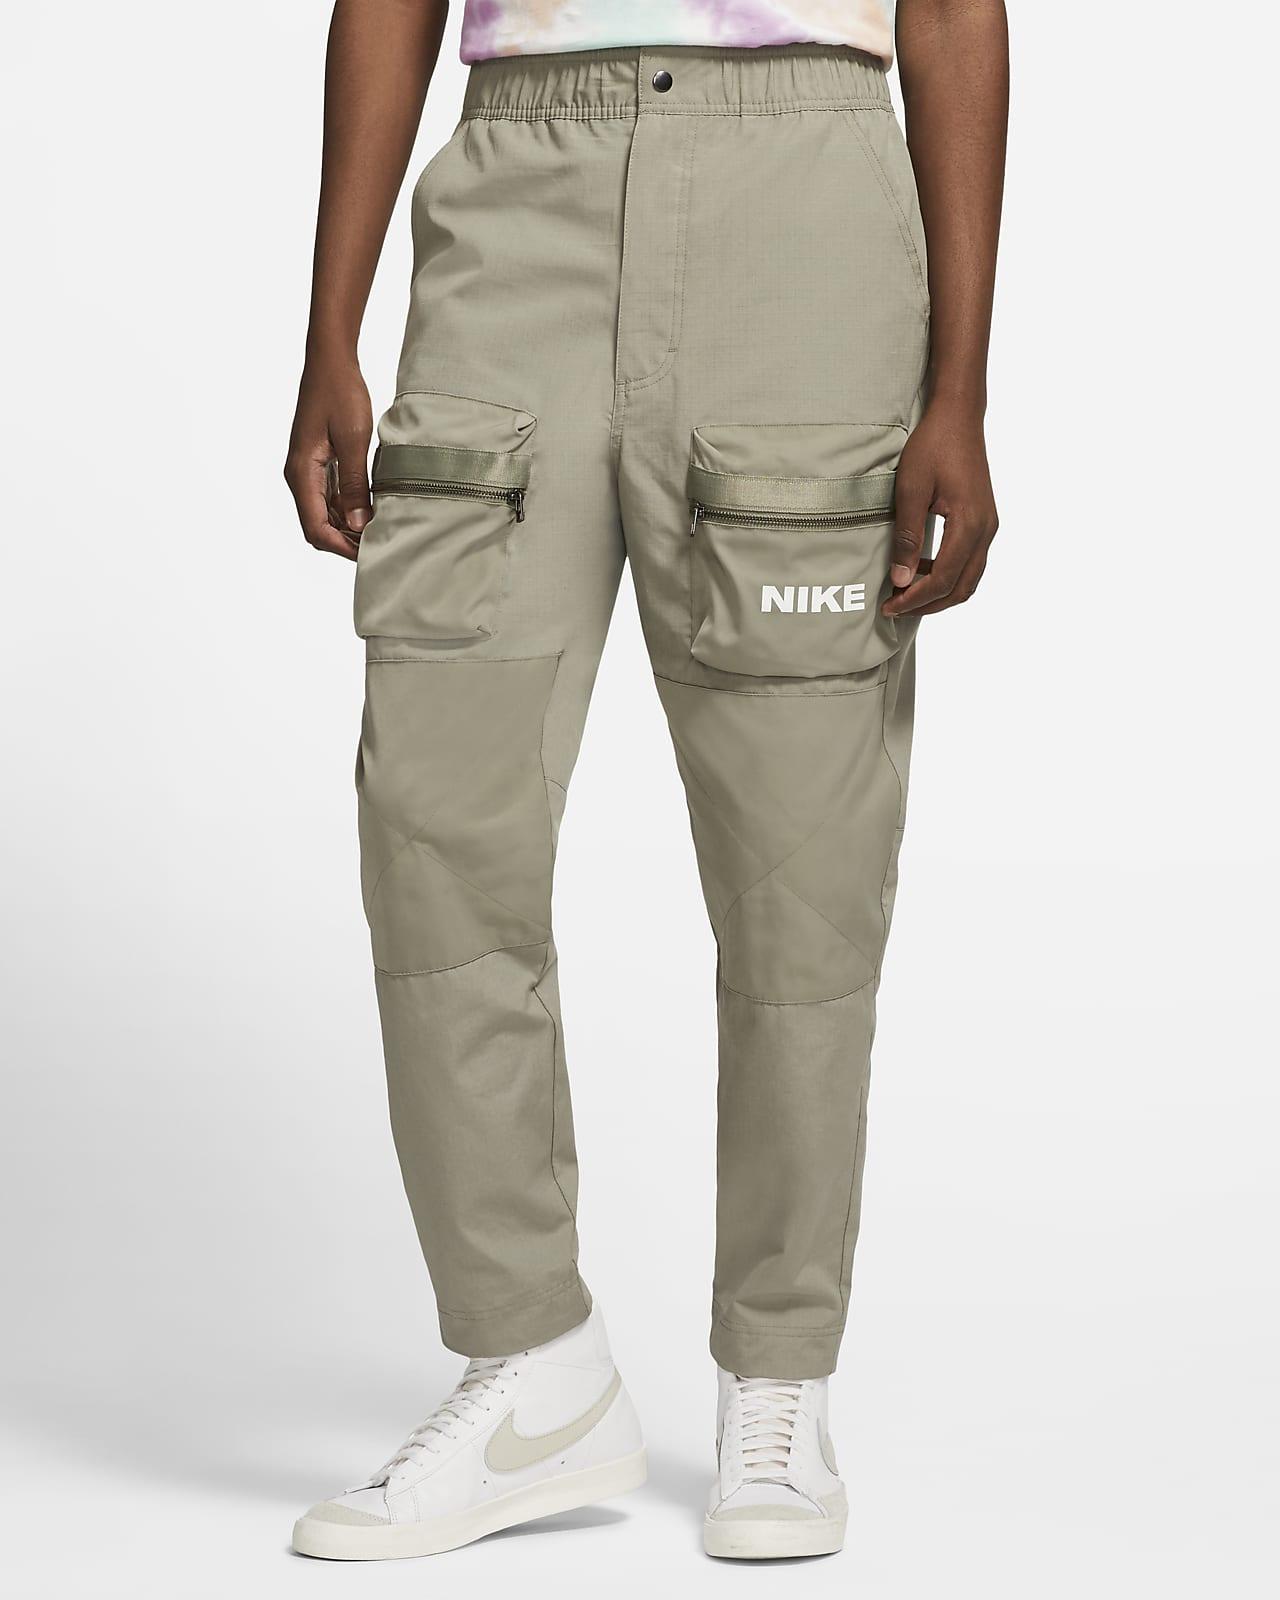 Nike Sportswear City Made Herren-Webhose